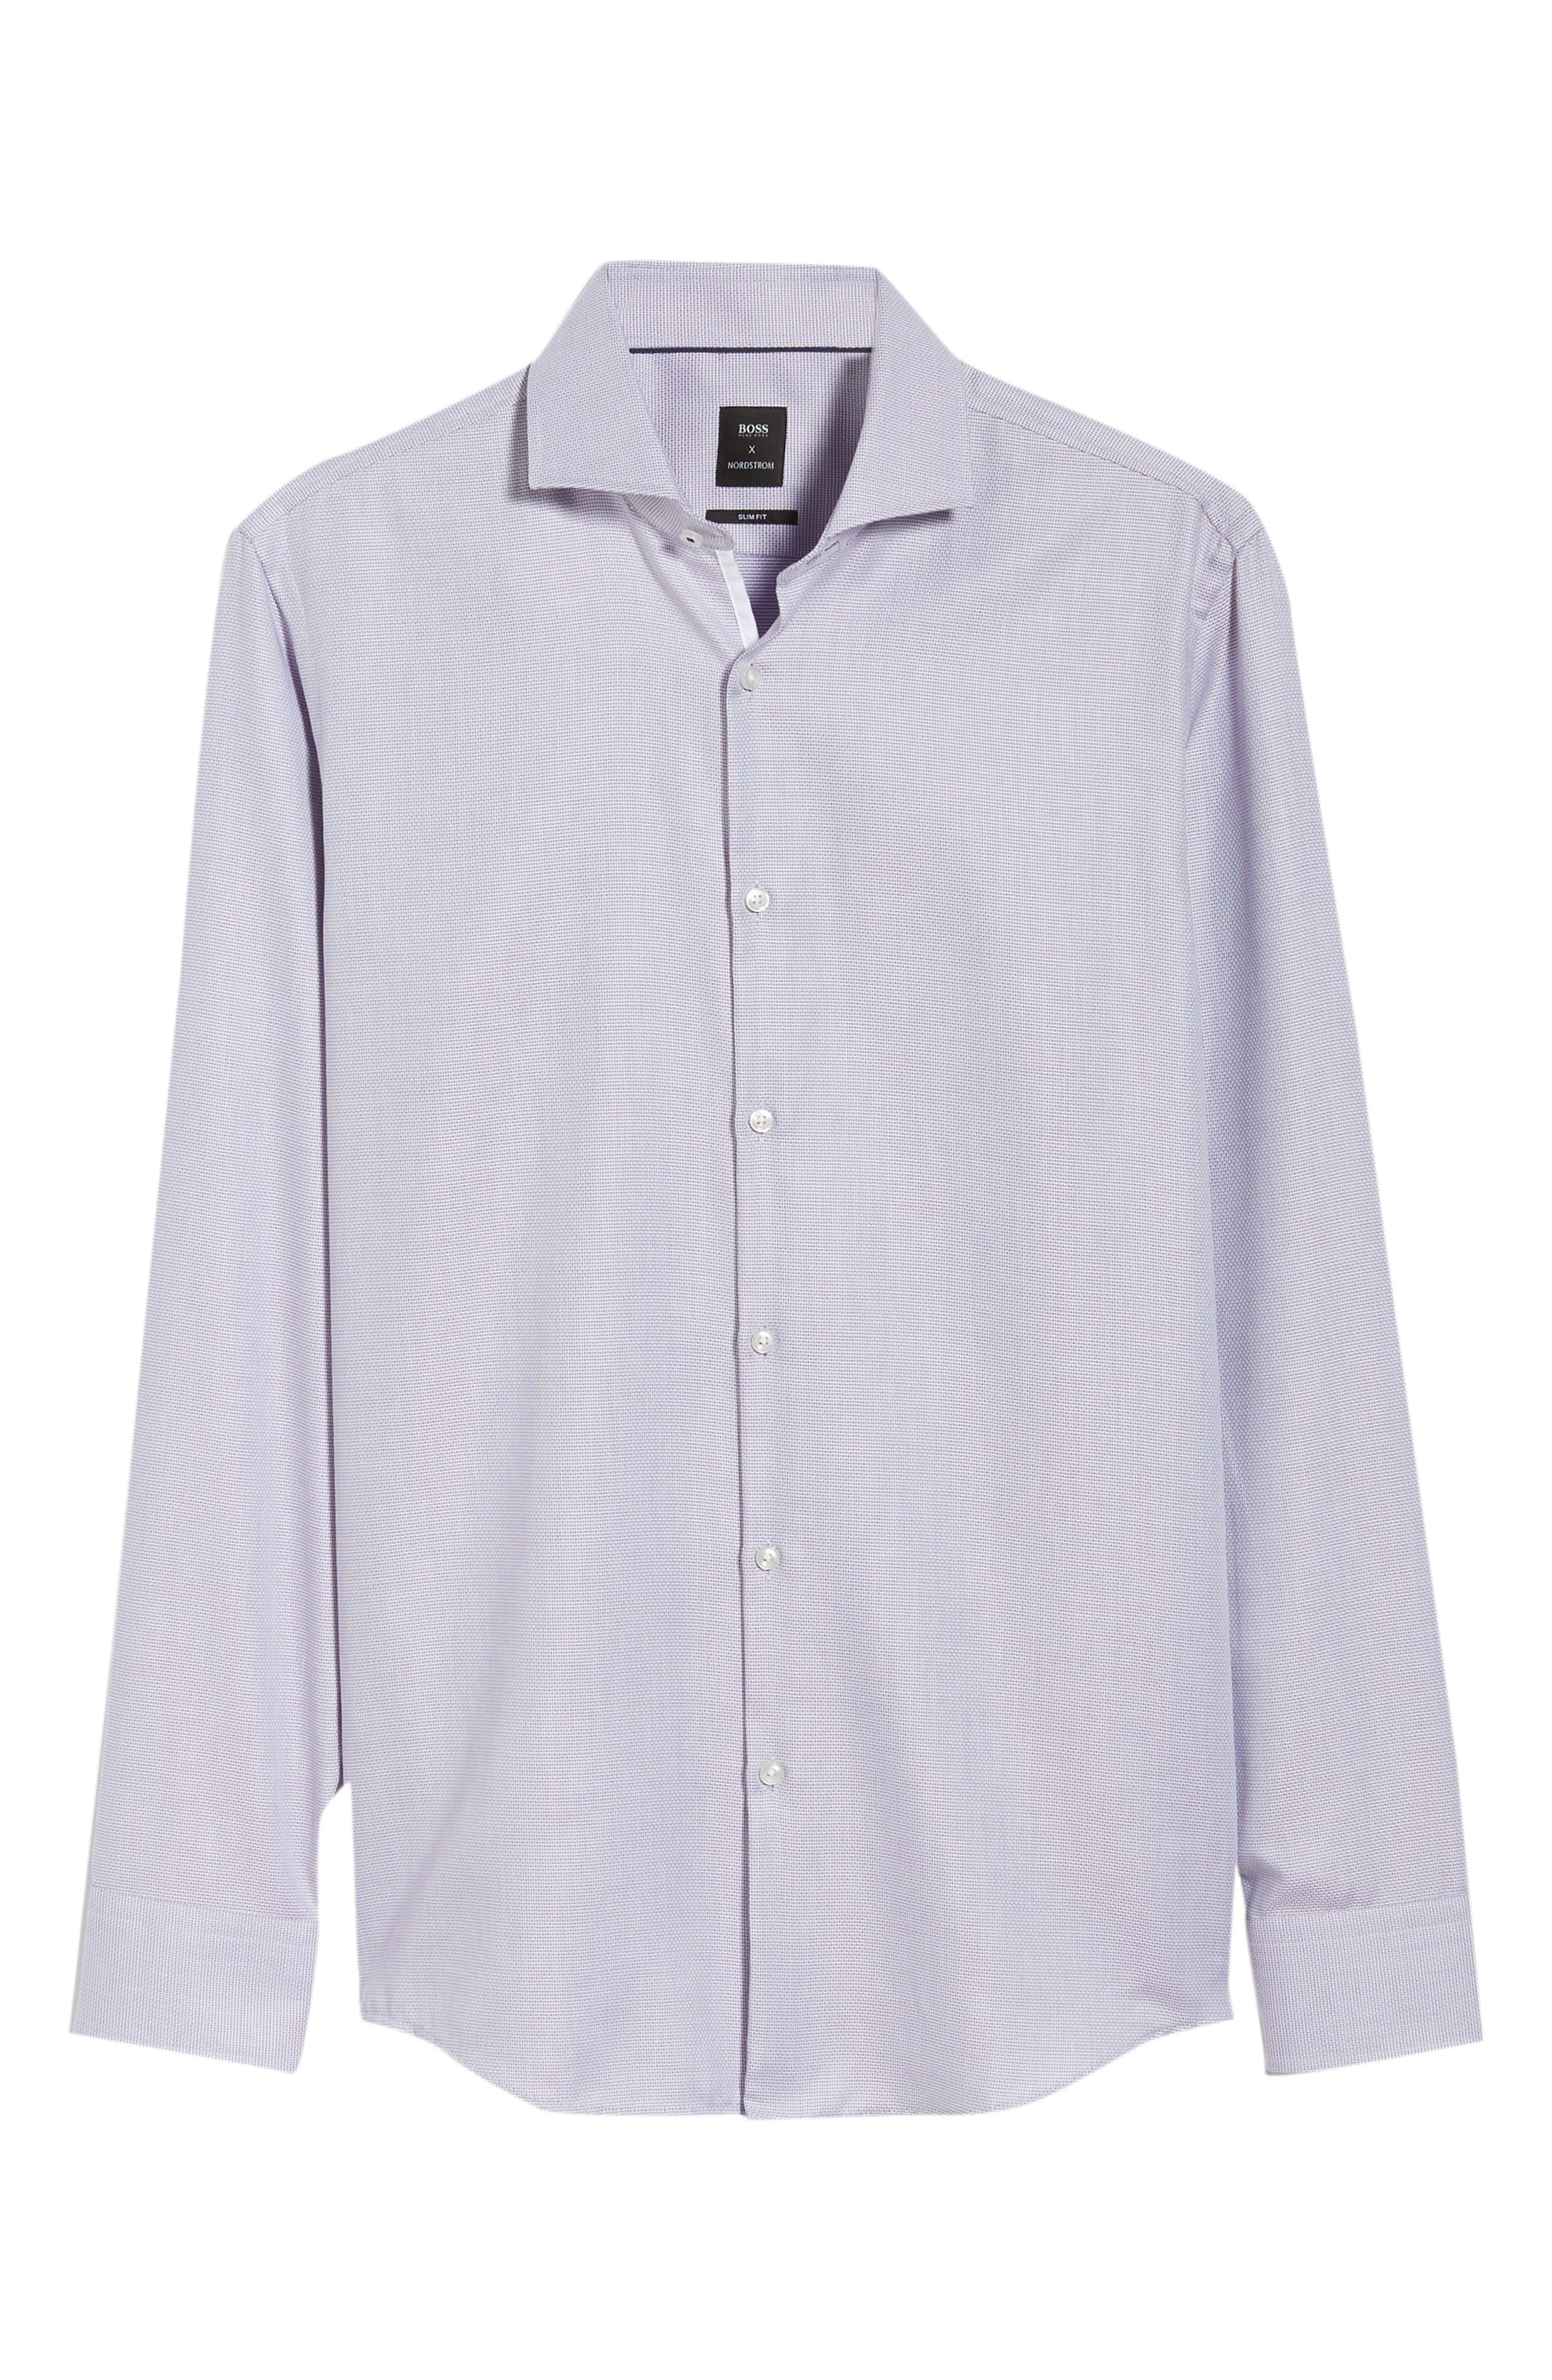 x Nordstrom Jerrin Slim Fit Solid Dress Shirt,                             Alternate thumbnail 5, color,                             LAVENDER